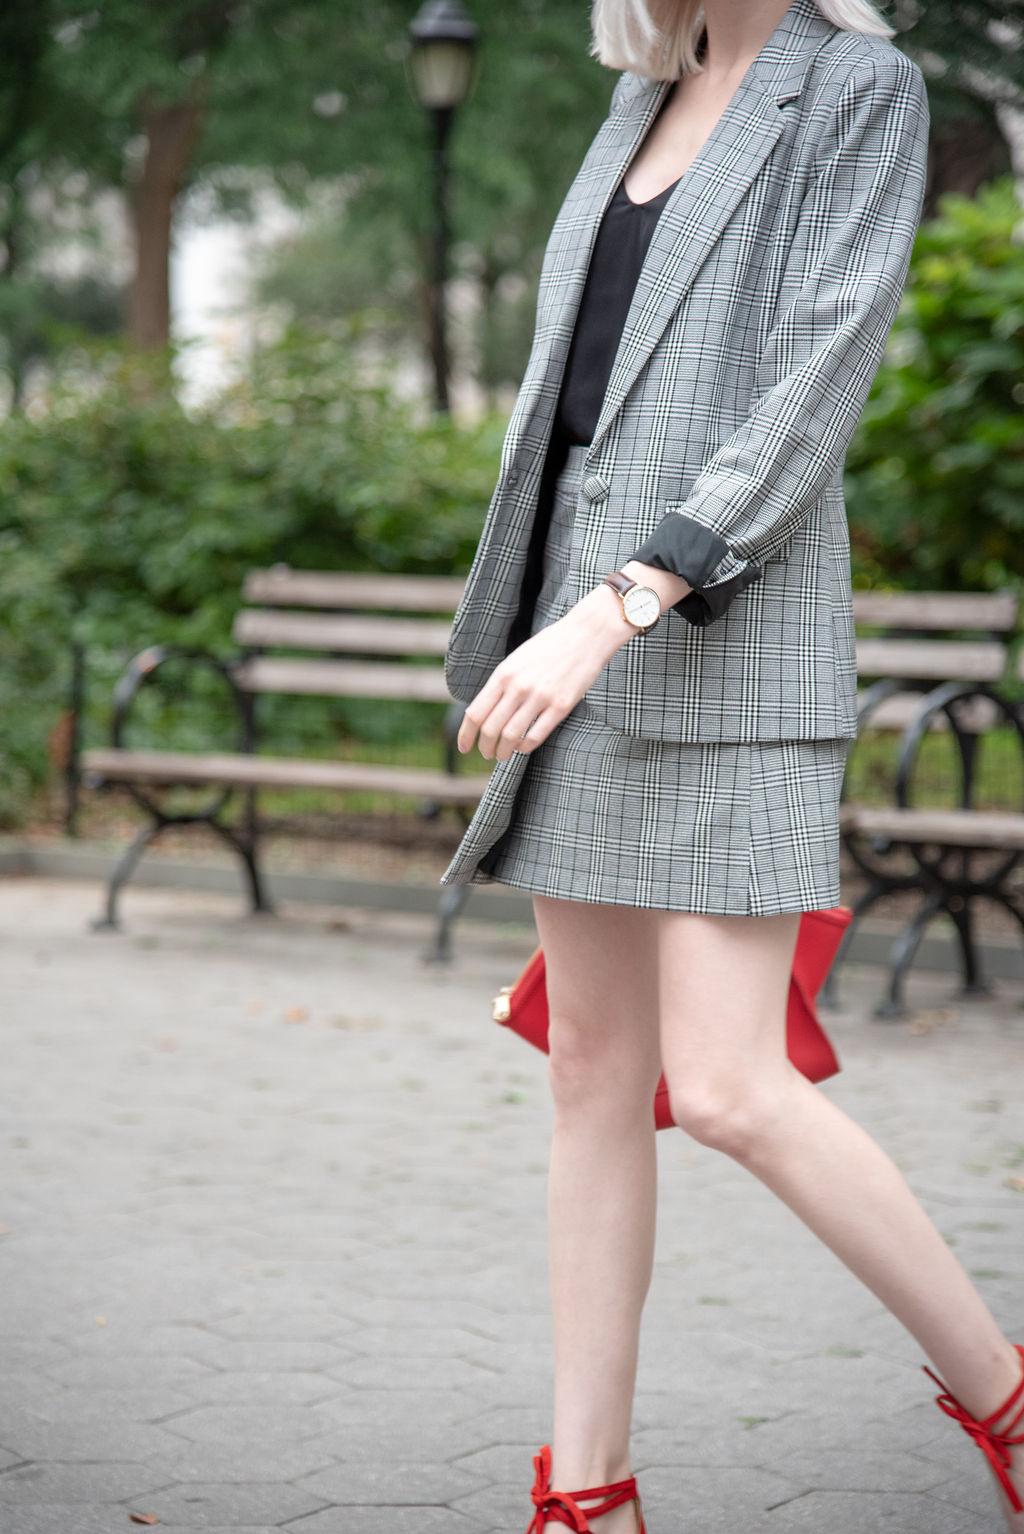 plaid suit, red beret, pantsuit outfit, jcrew outfit, fall style, new york city, daniel wellington